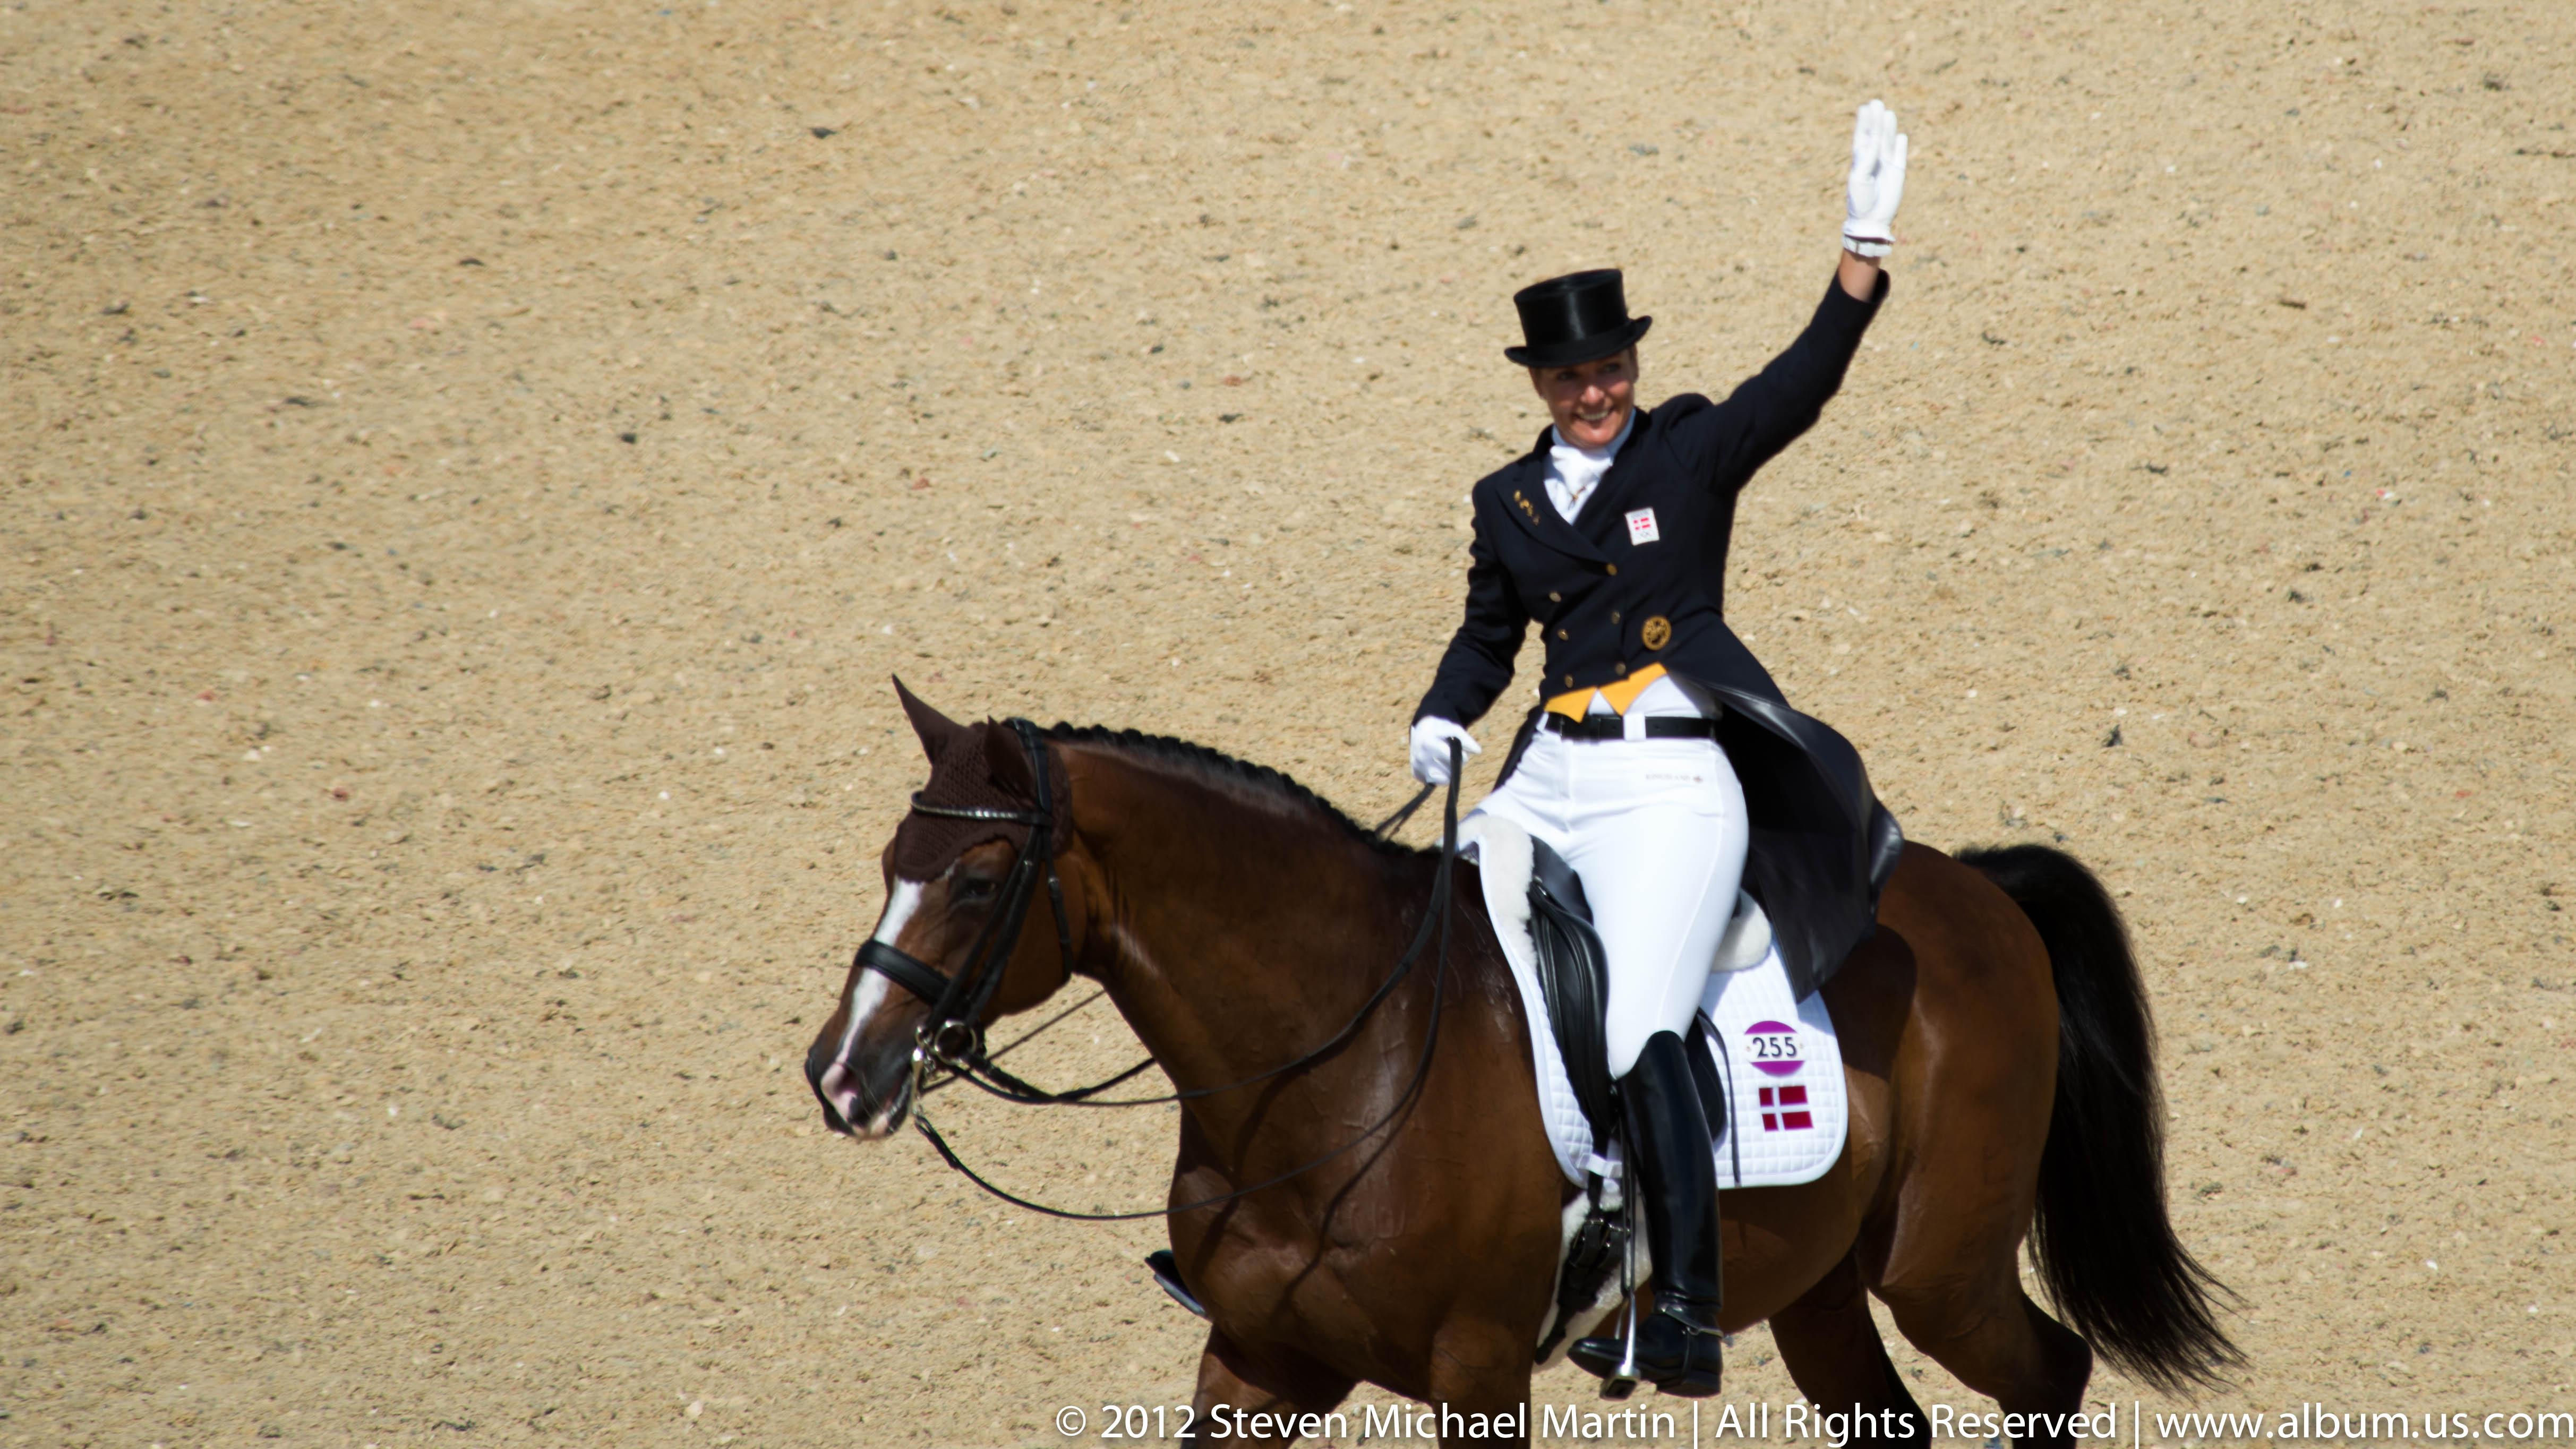 SMartin_2012 Olympics Equestrian Dressage_20120802_006